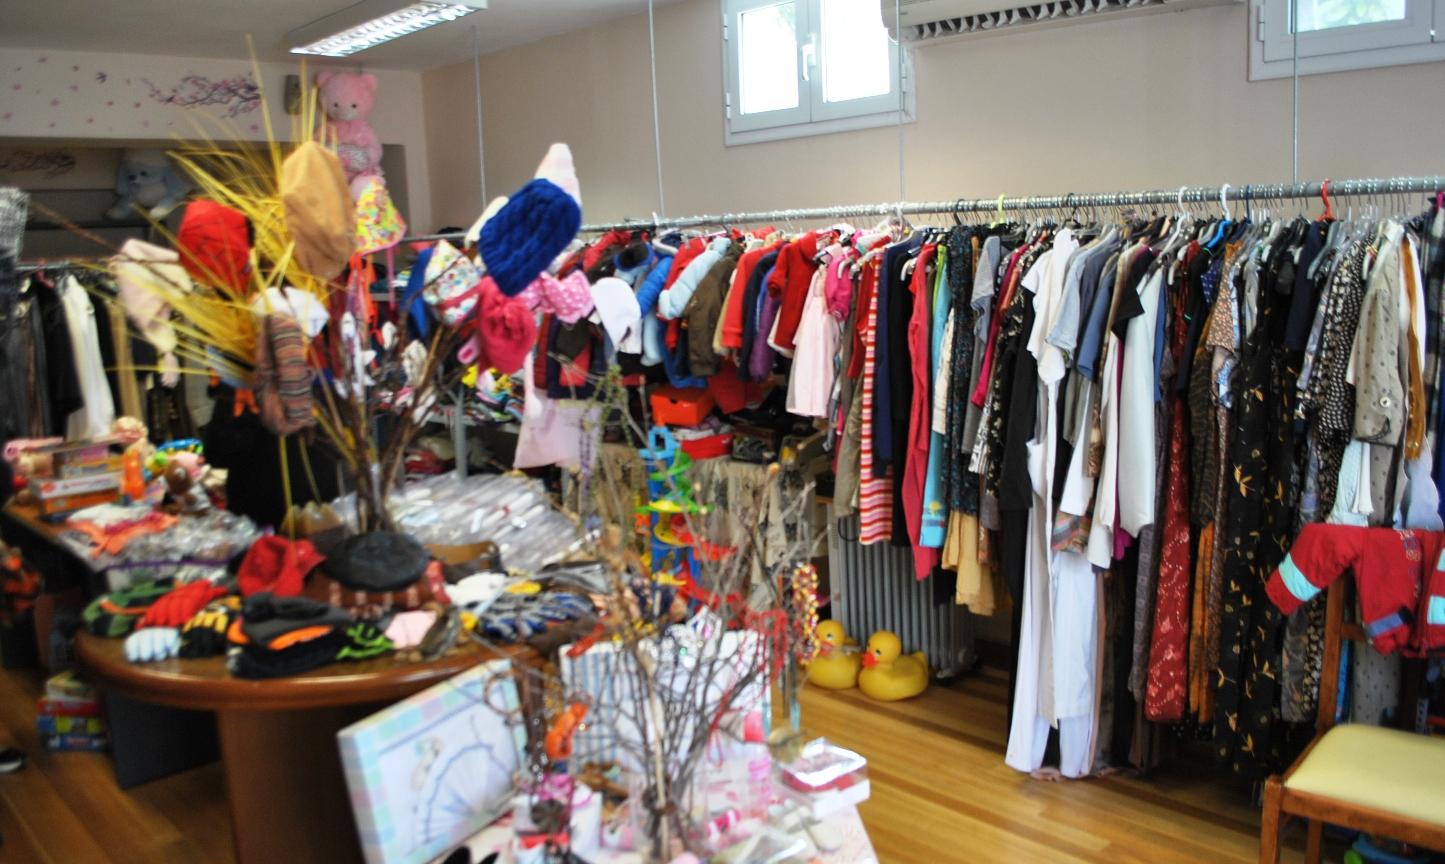 a5946278f12 Παράλληλα, από τη Μ. Δευτέρα 10 Απριλίου μέχρι και τη Μ. Τετάρτη 12  Απριλίου, η Κοινωνική Ιματιοθήκη προσέφερε στους ωφελούμενους και στα  παιδιά τους, ρούχα ...